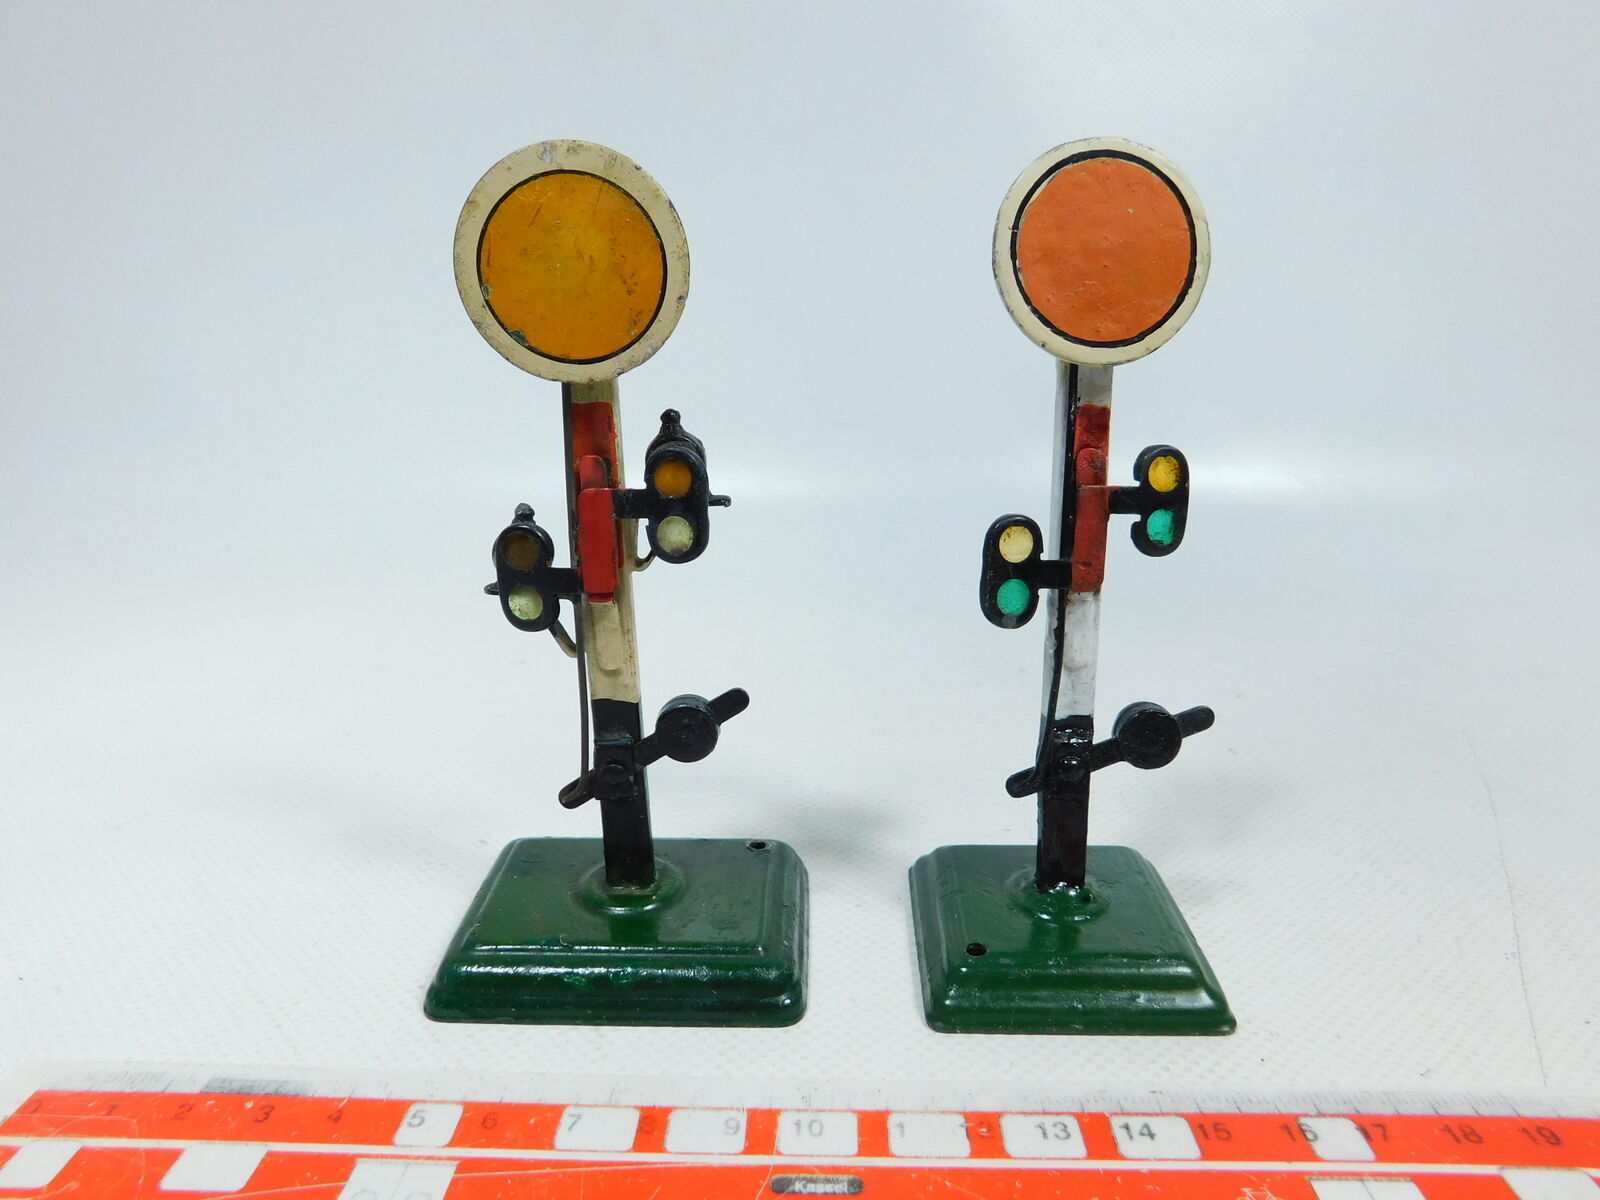 Bv991-0, 5 x märklin spur 0 signal (12 cm)  2328 0 + 2336 0